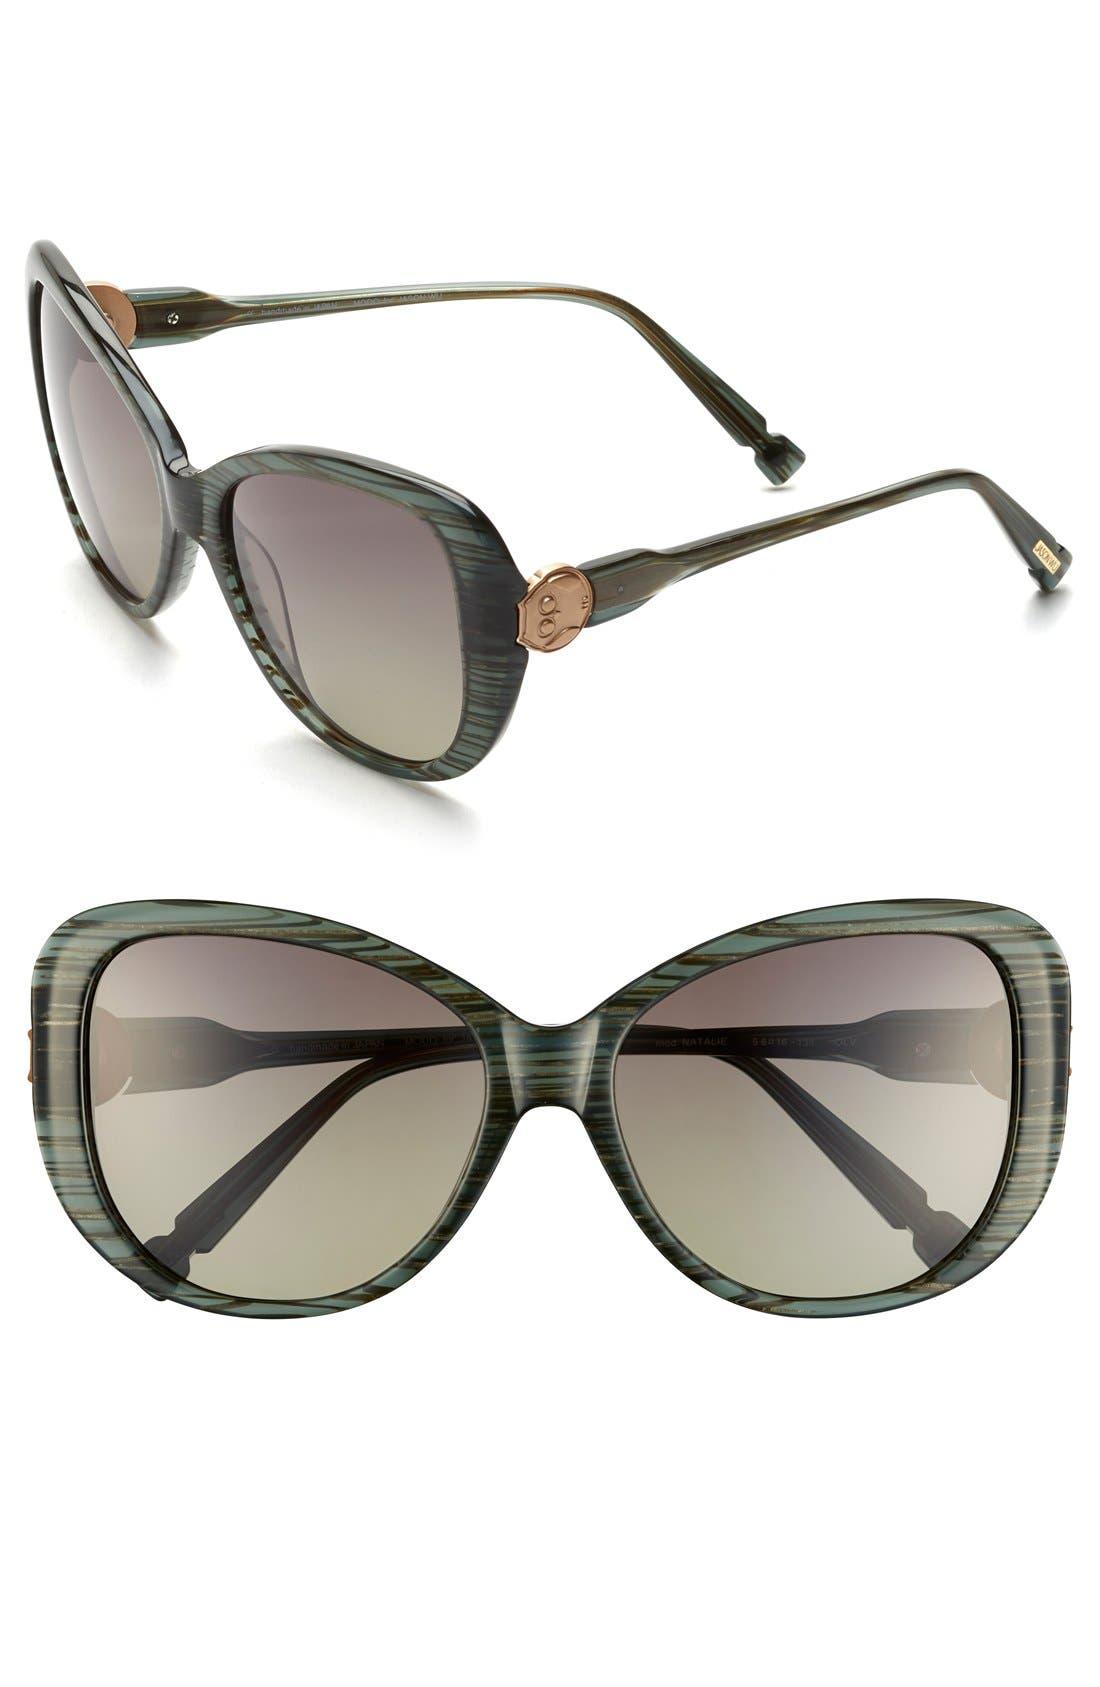 Main Image - Jason Wu 'Natalie' 56mm Sunglasses